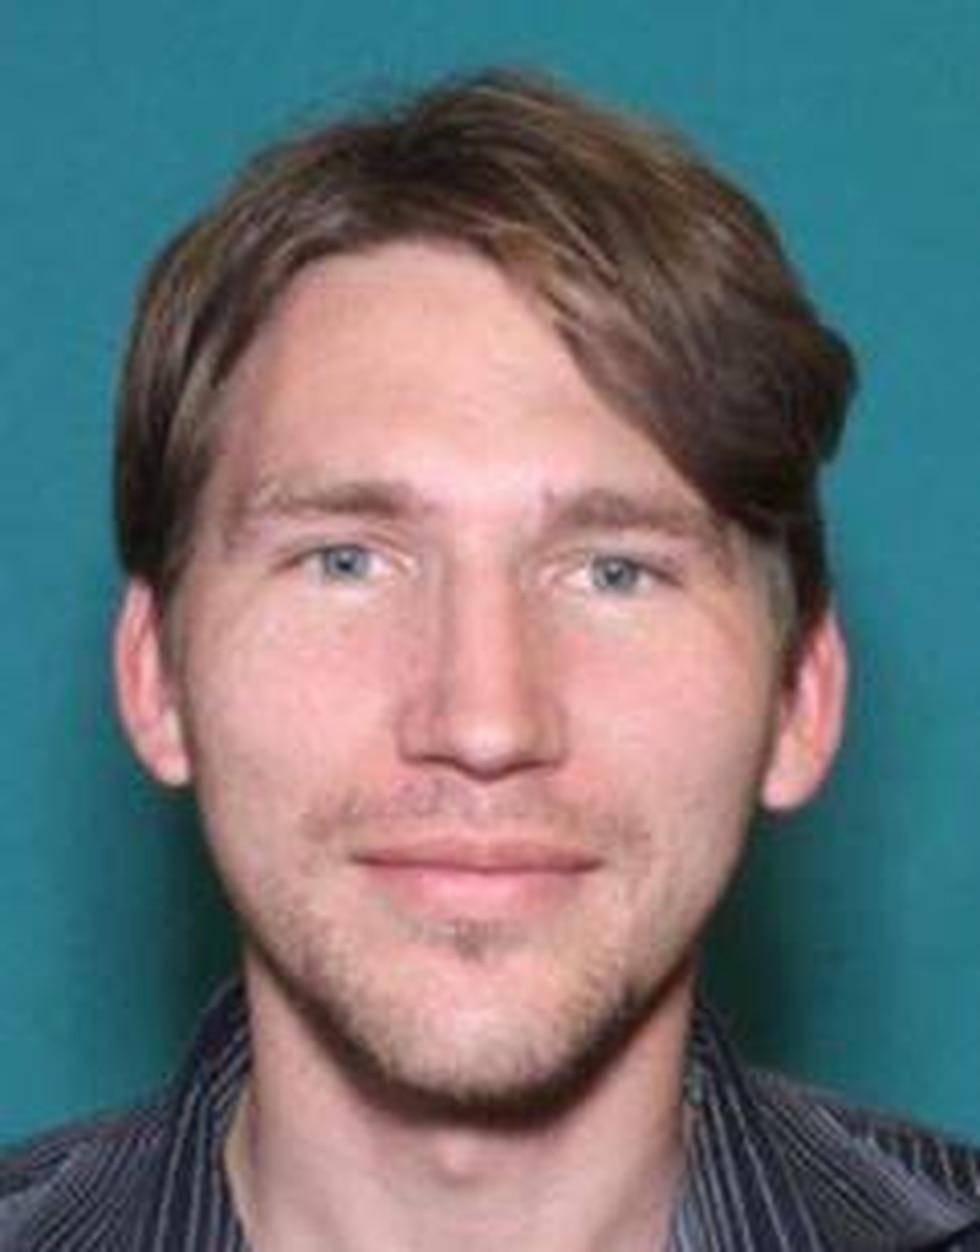 Cory Lee Reed, 30, of Lubbock